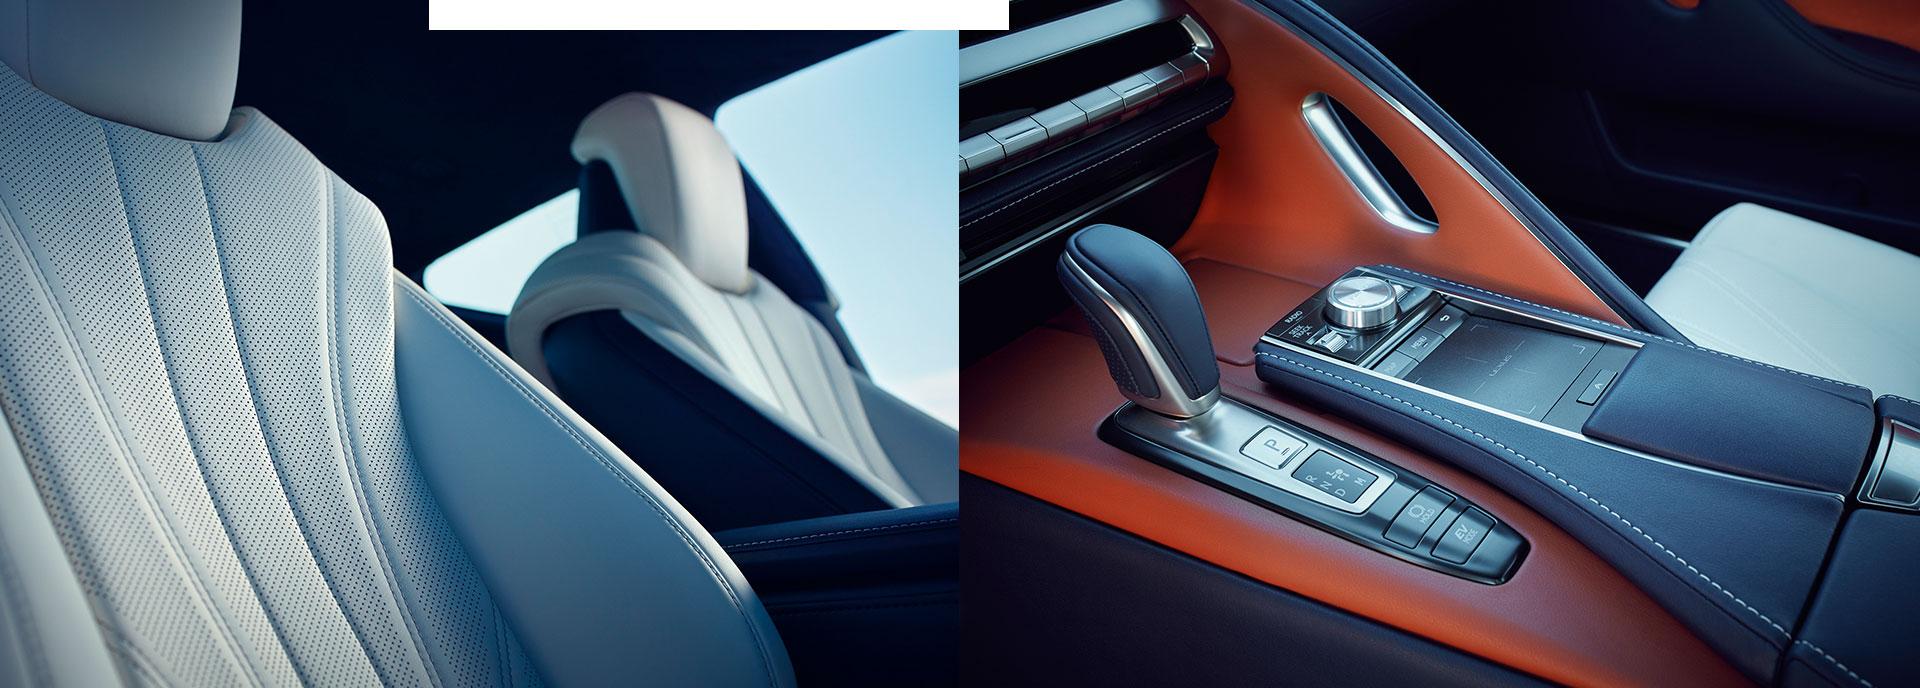 Lexus LC 500h Hybrid ylivertainen viimeistely